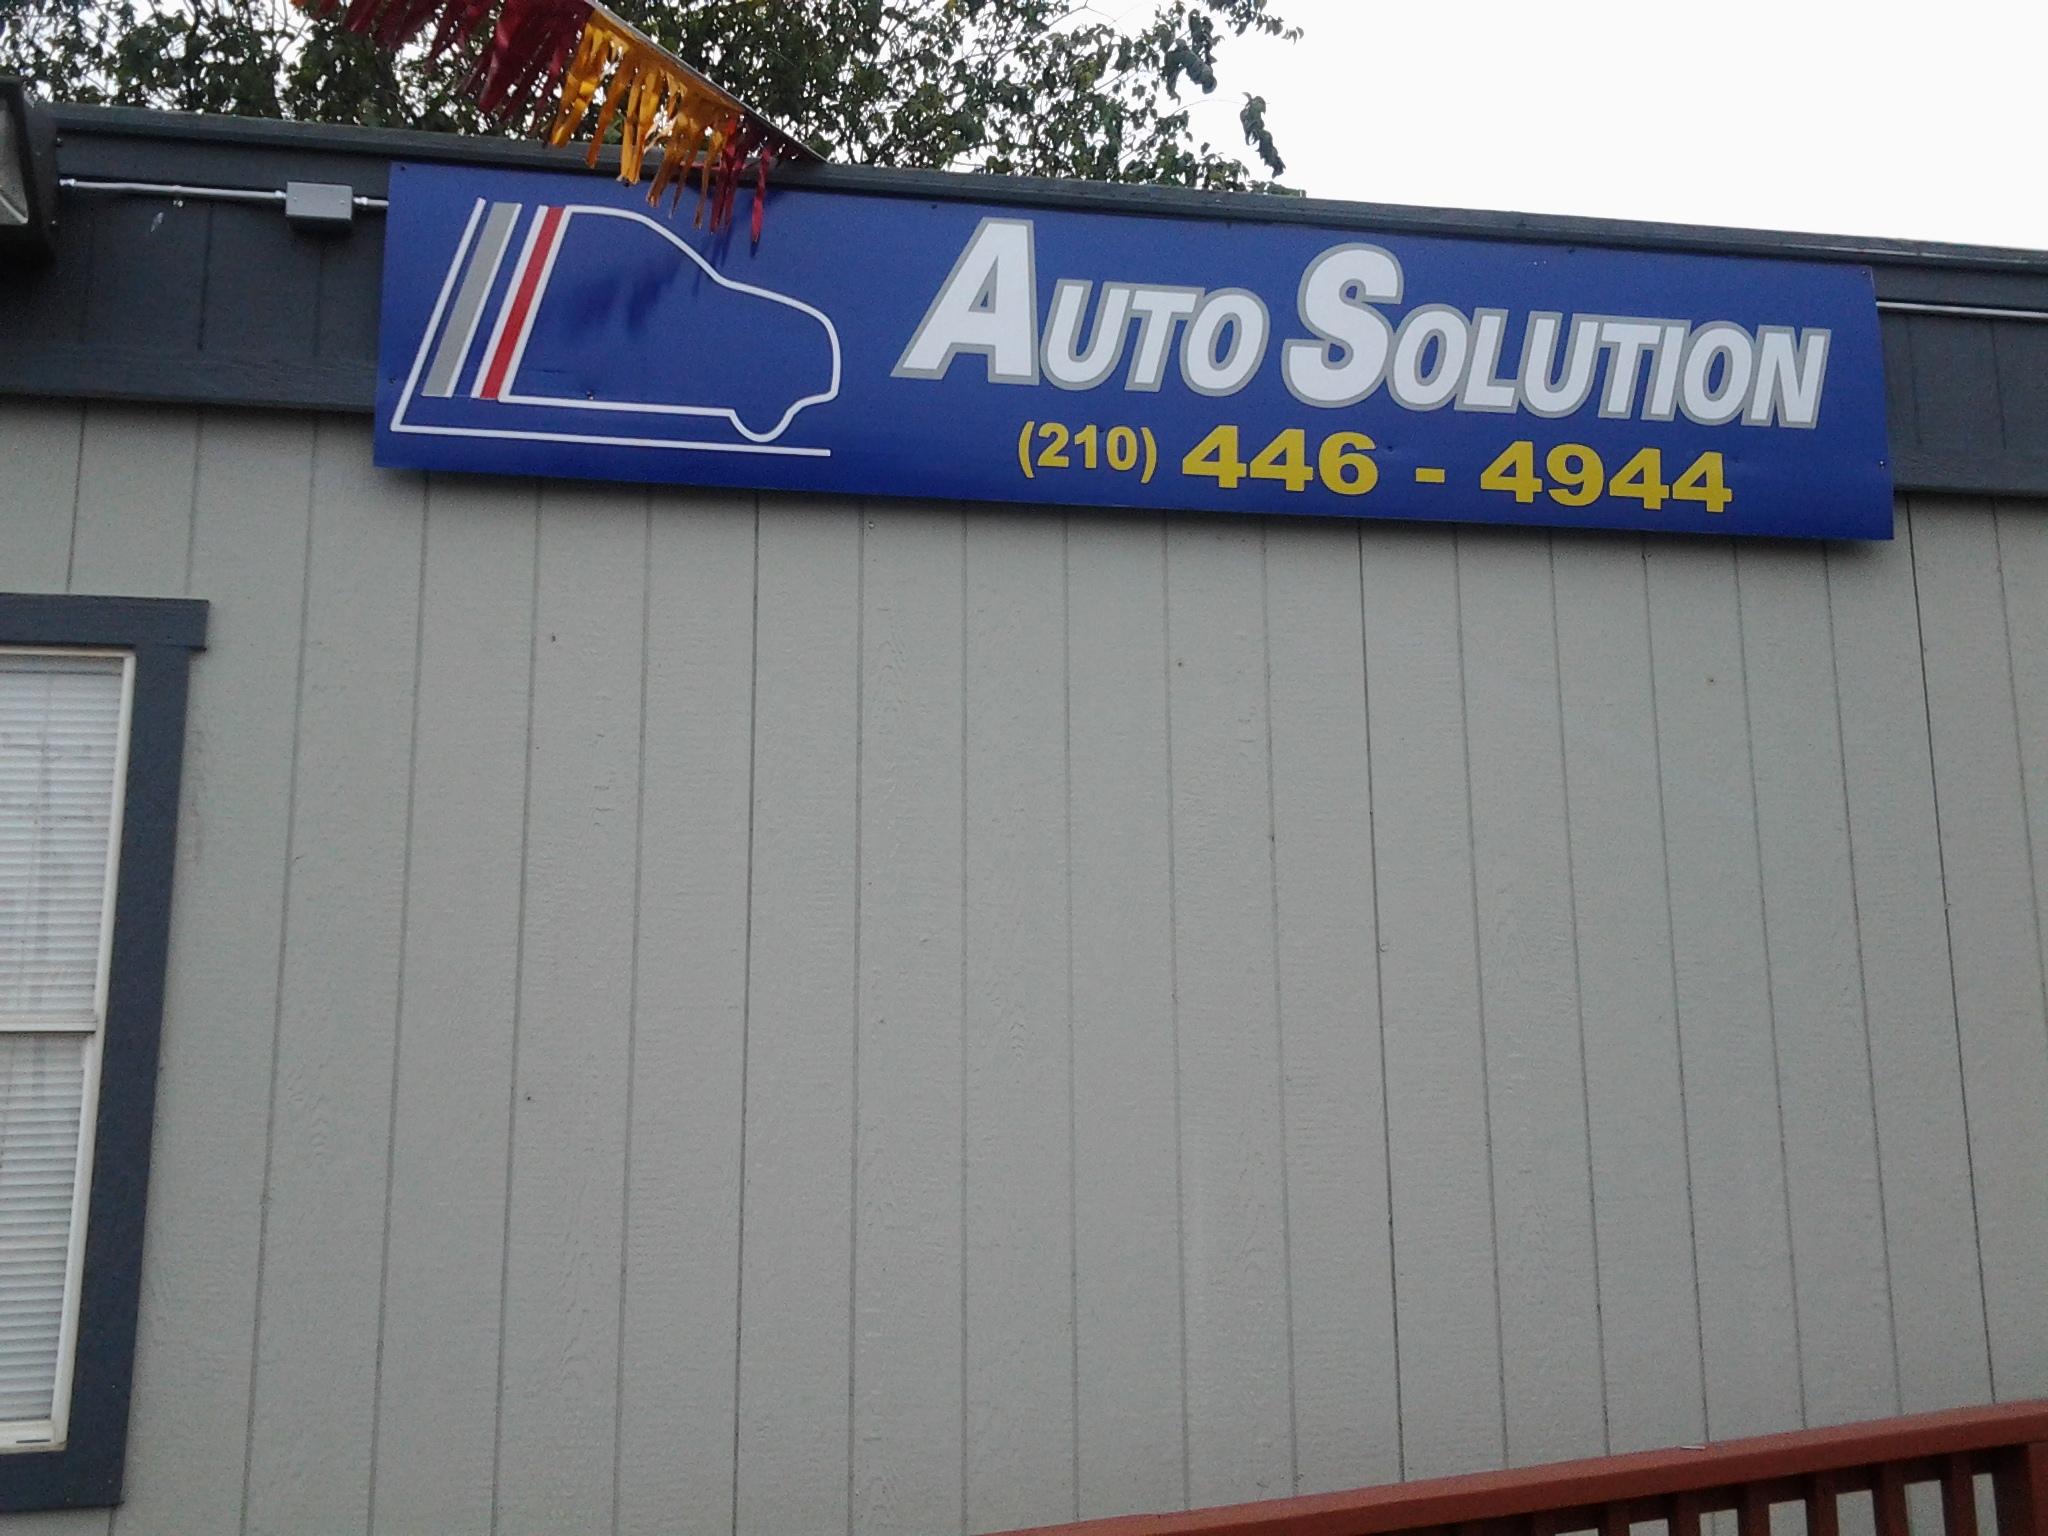 Auto Solution image 5